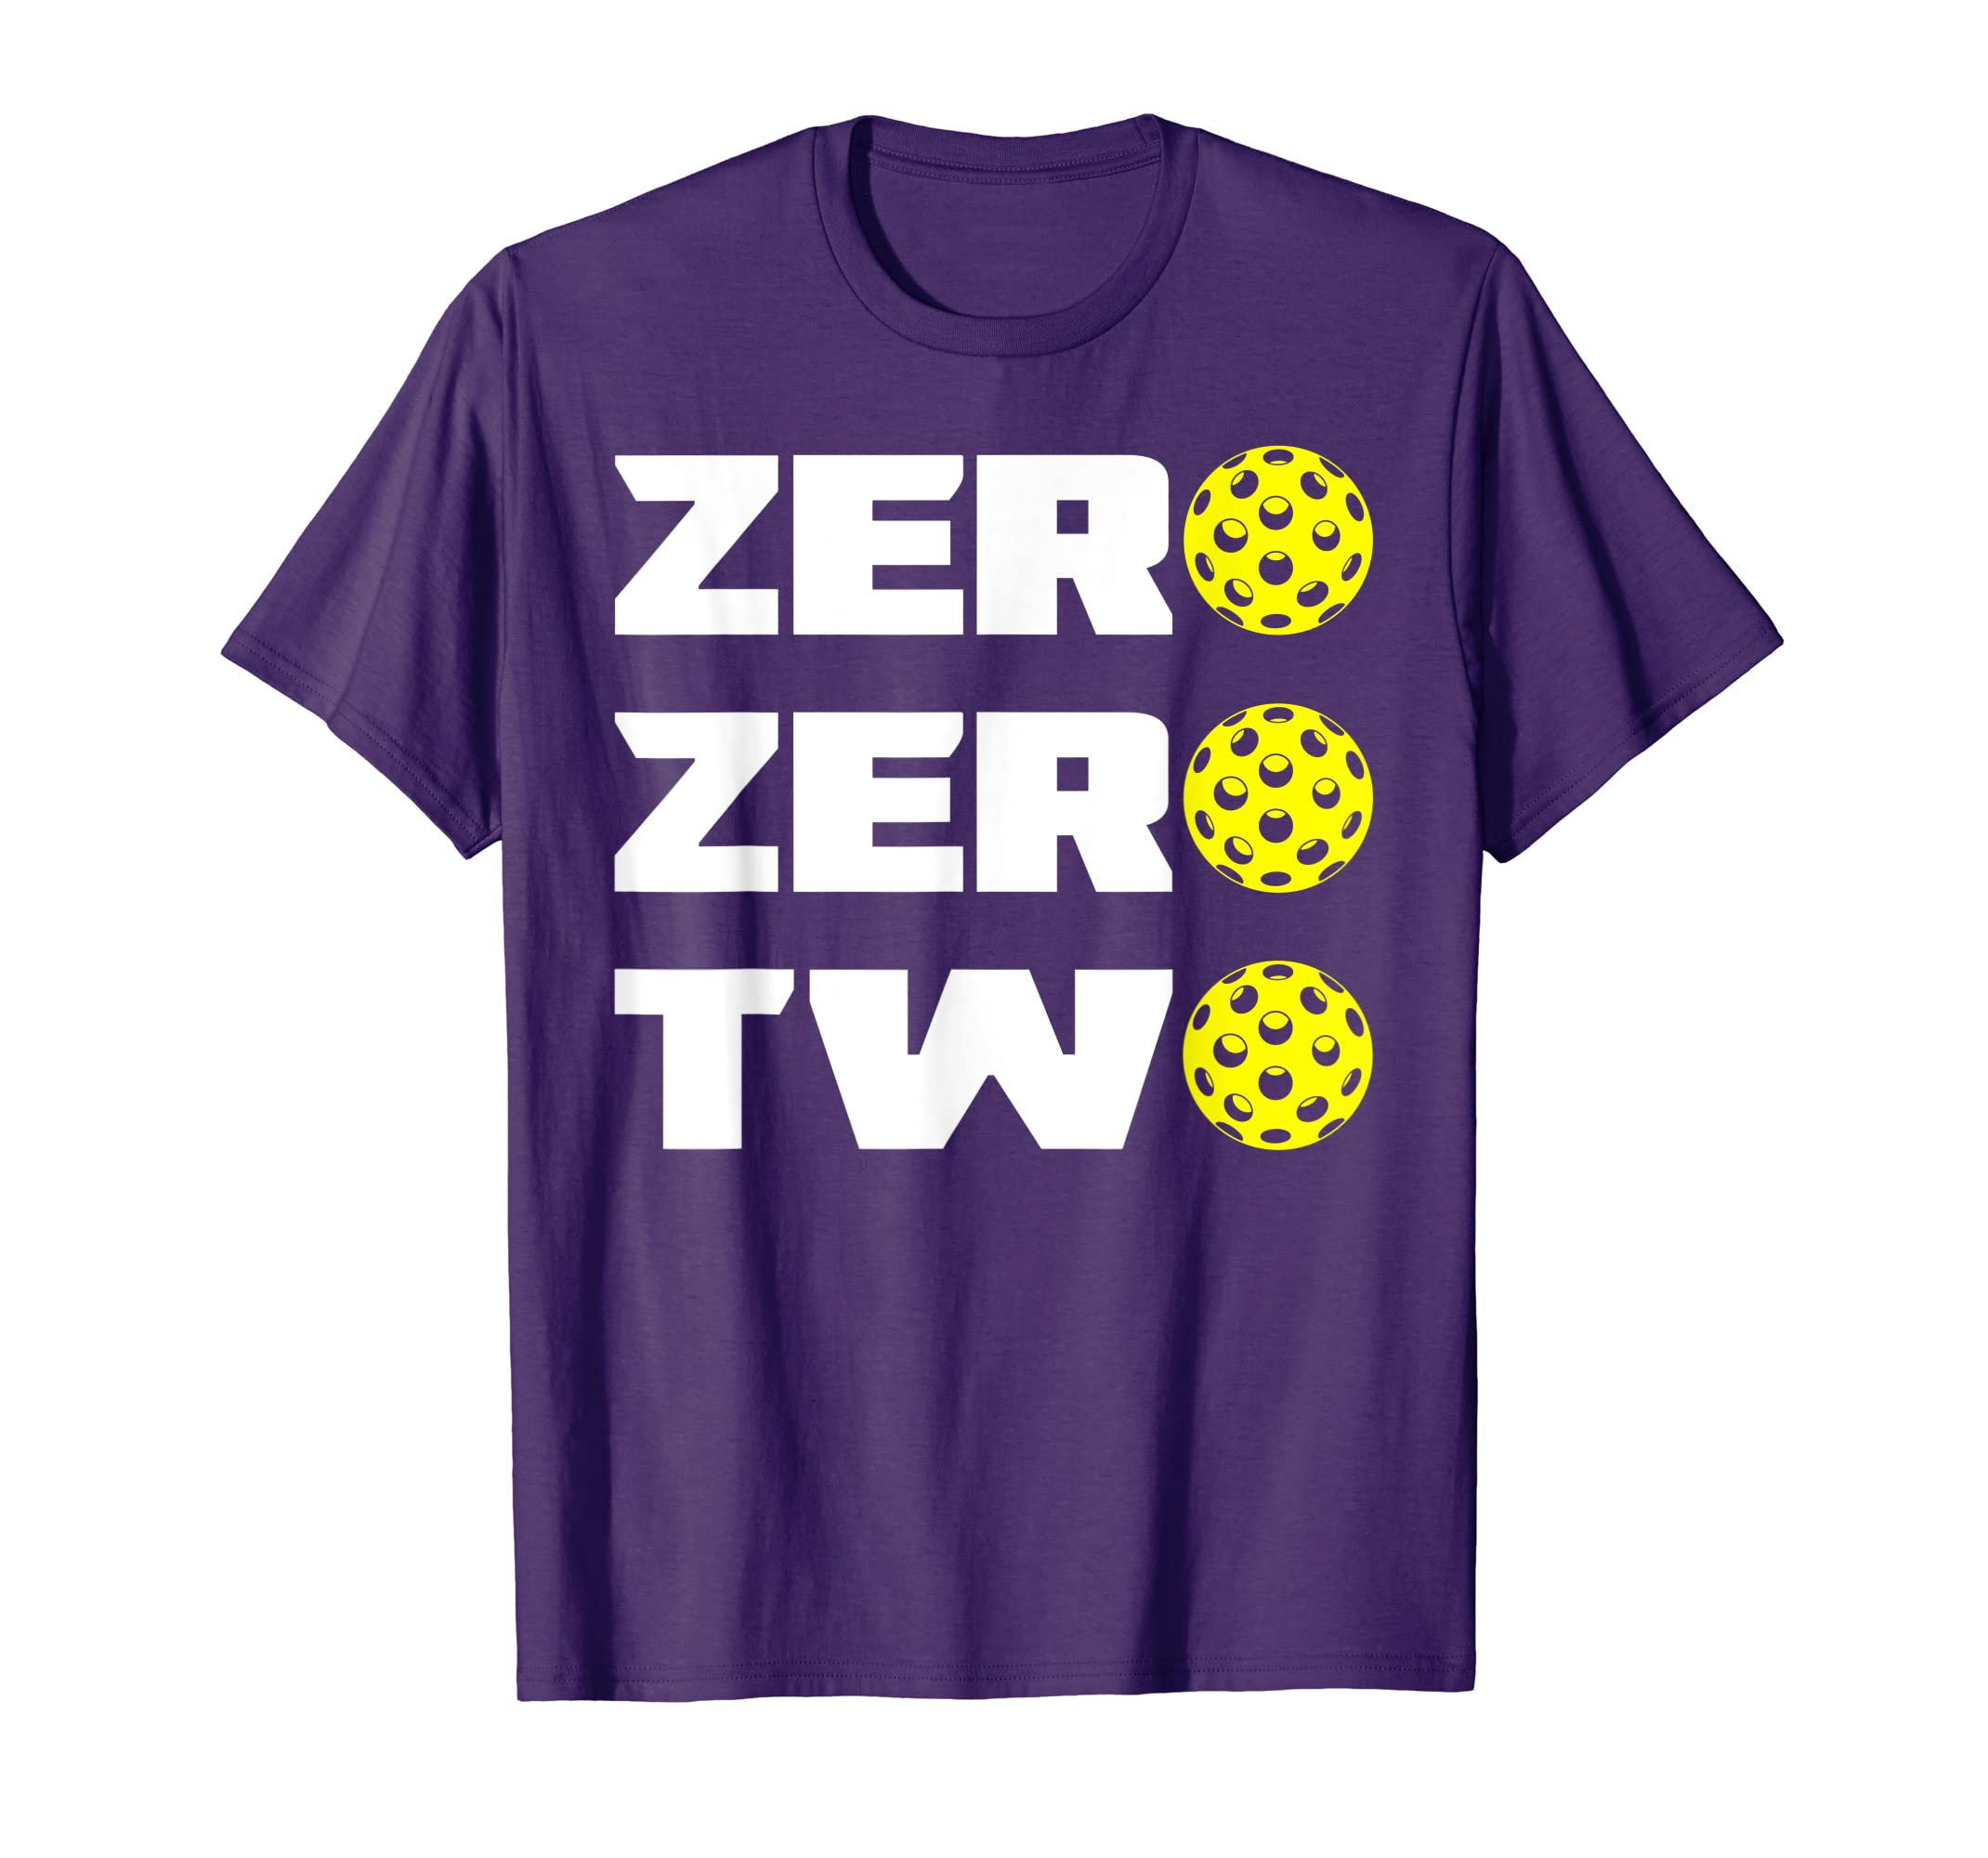 ecf042866 Zero Zero Two Dinking Pickleball Gift T Shirt-azvn – Anzvntee